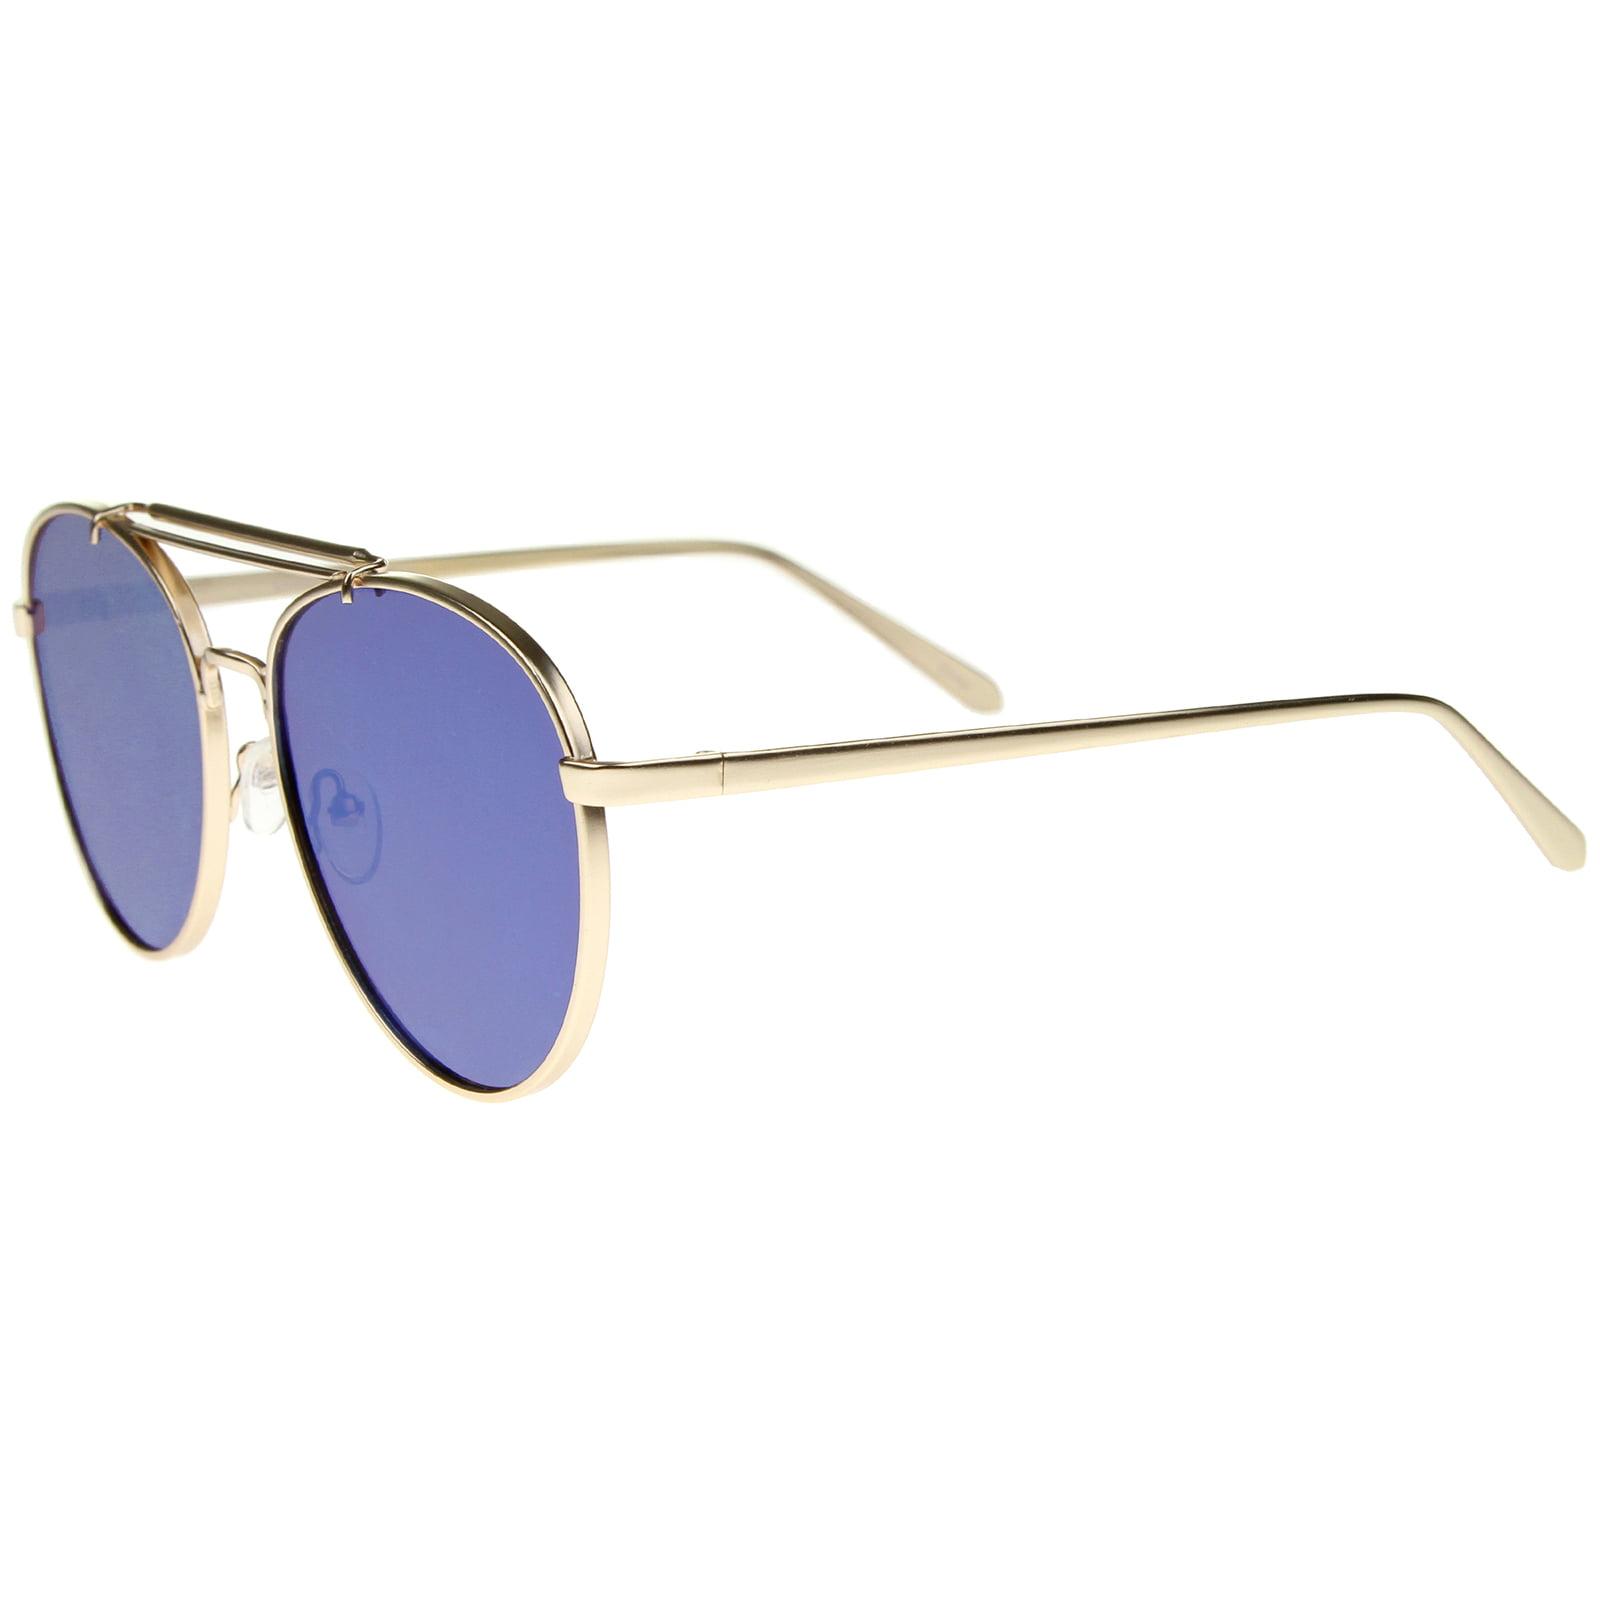 bf39bbd9d99f1 sunglass.la - sunglassLA - Large Metal Teardrop Double Bridge Mirrored Flat  Lens Aviator Sunglasses - 60mm - Walmart.com